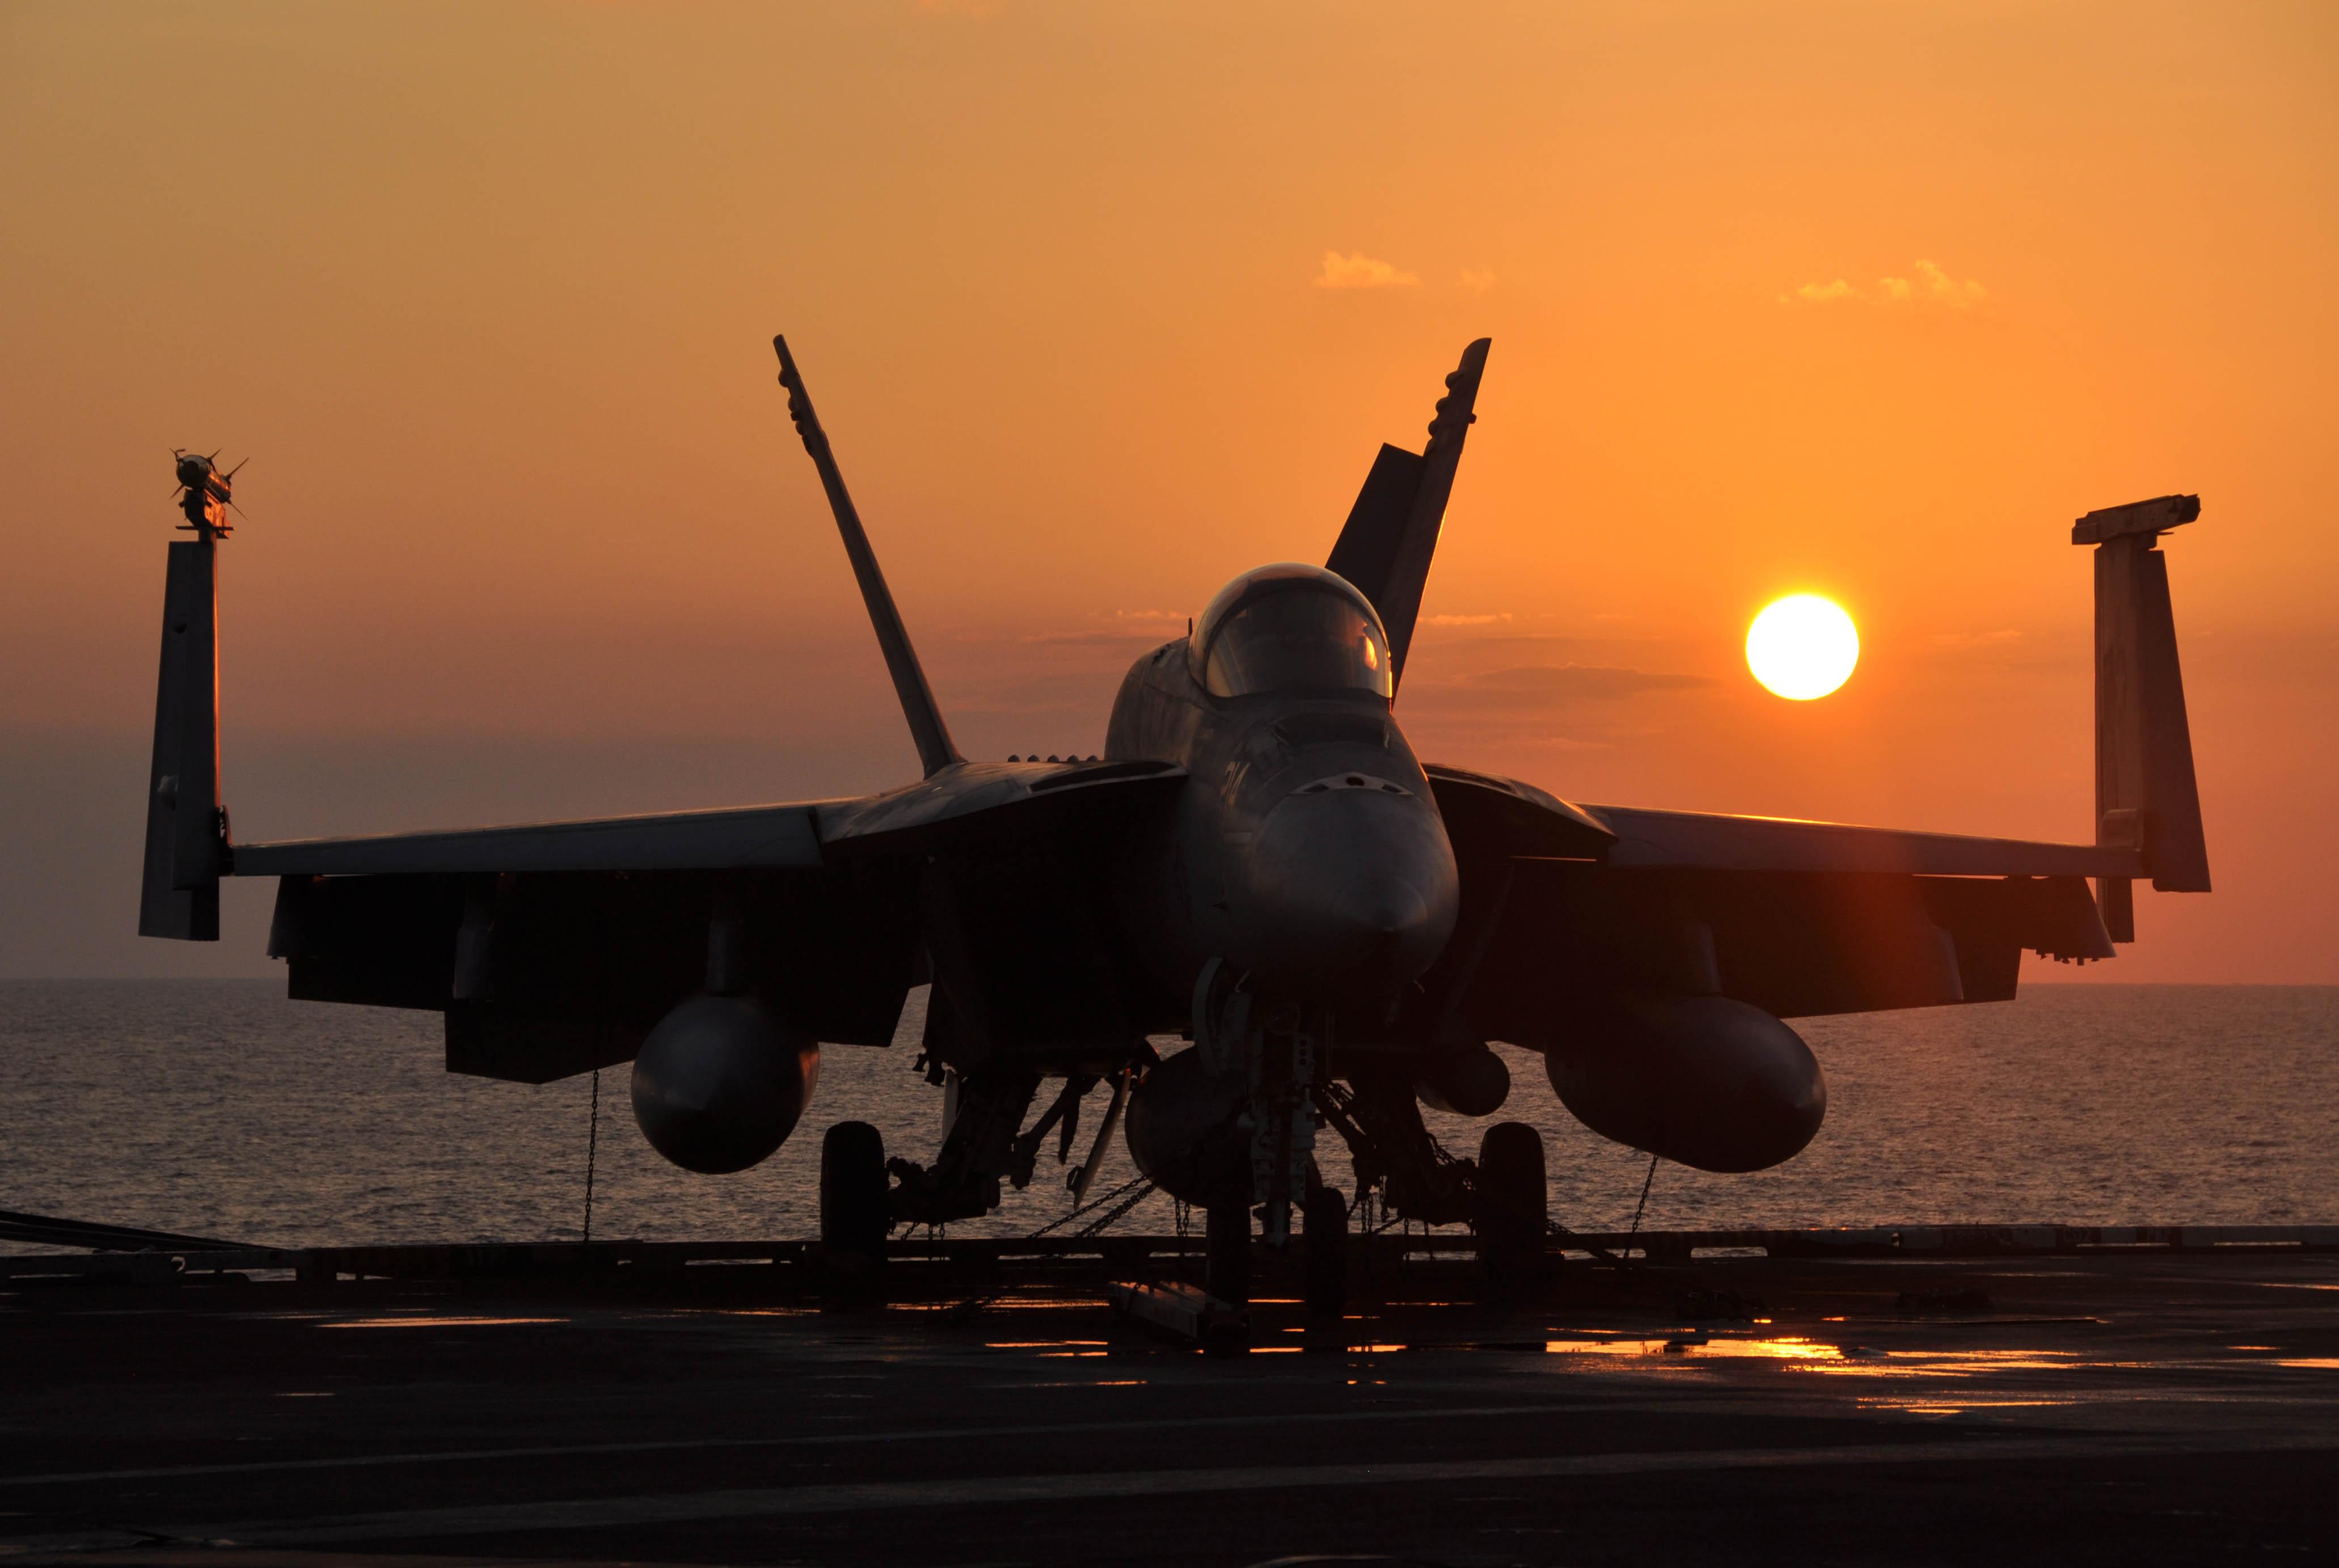 http://upload.wikimedia.org/wikipedia/commons/f/f6/F_A-18E_Super_Hornet_aircraft.jpg